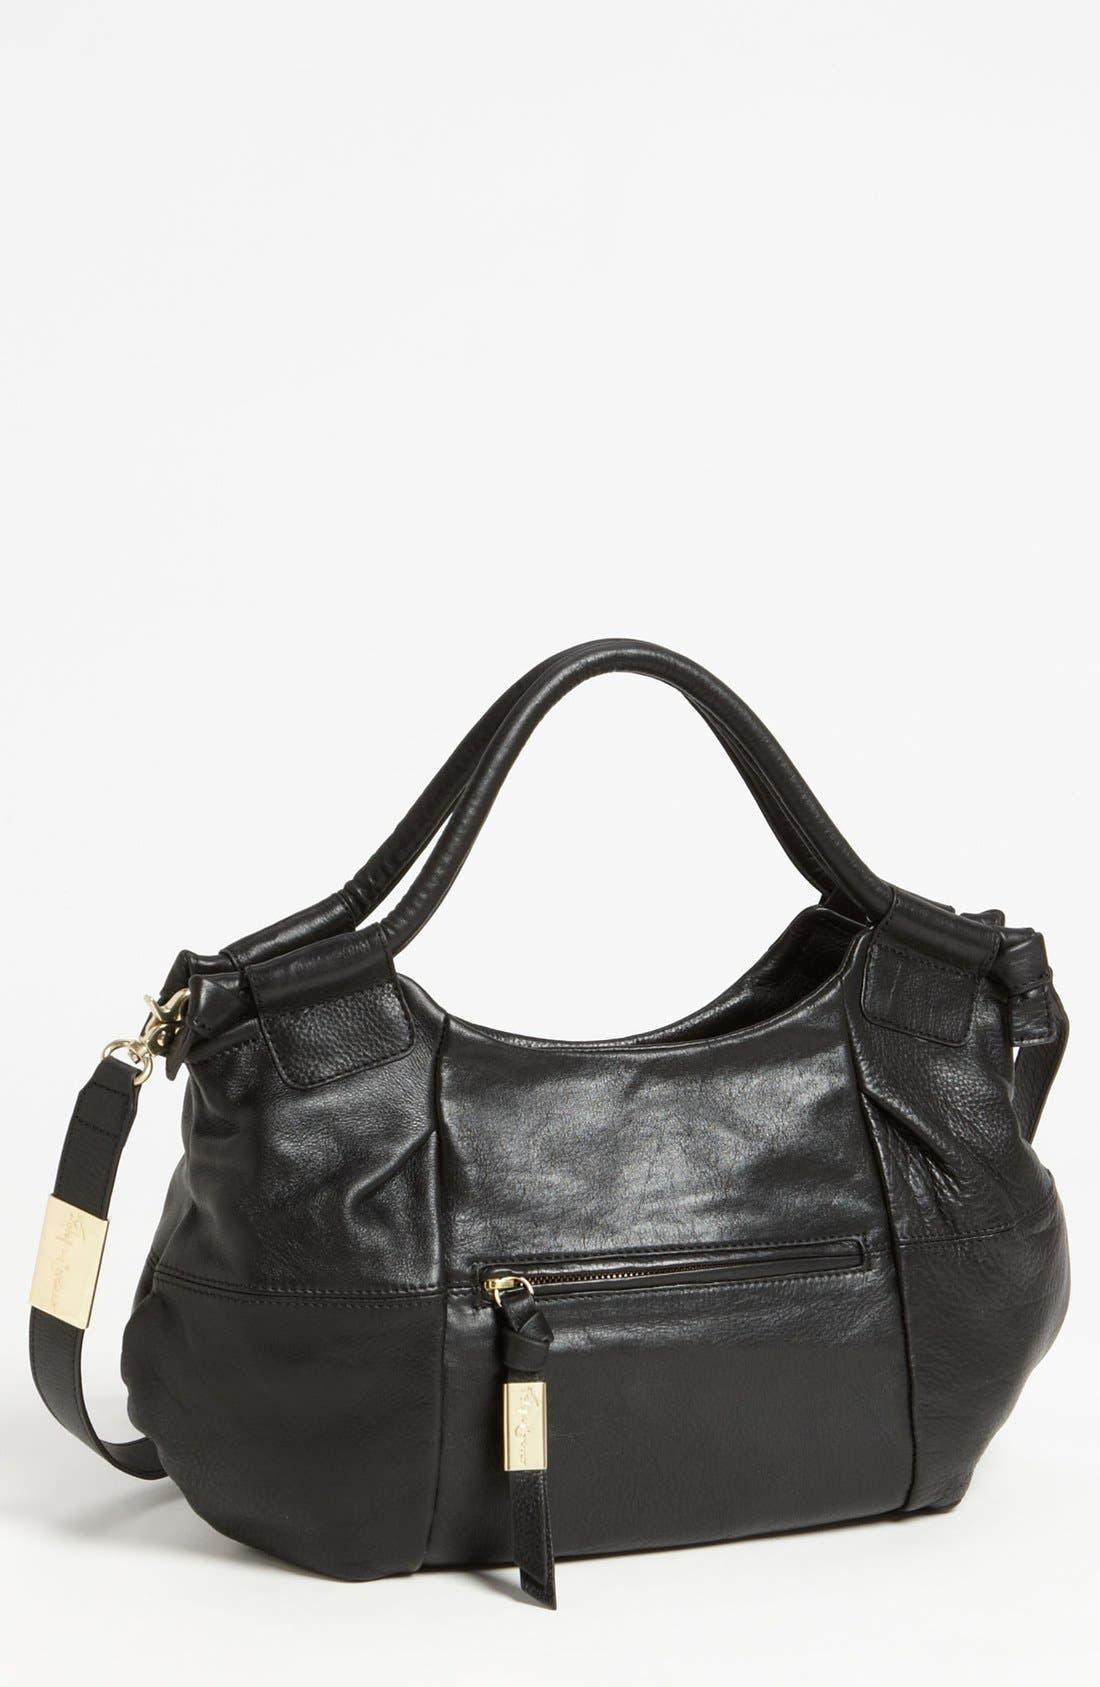 Alternate Image 1 Selected - Foley + Corinna 'Kami - Mini' Leather Satchel